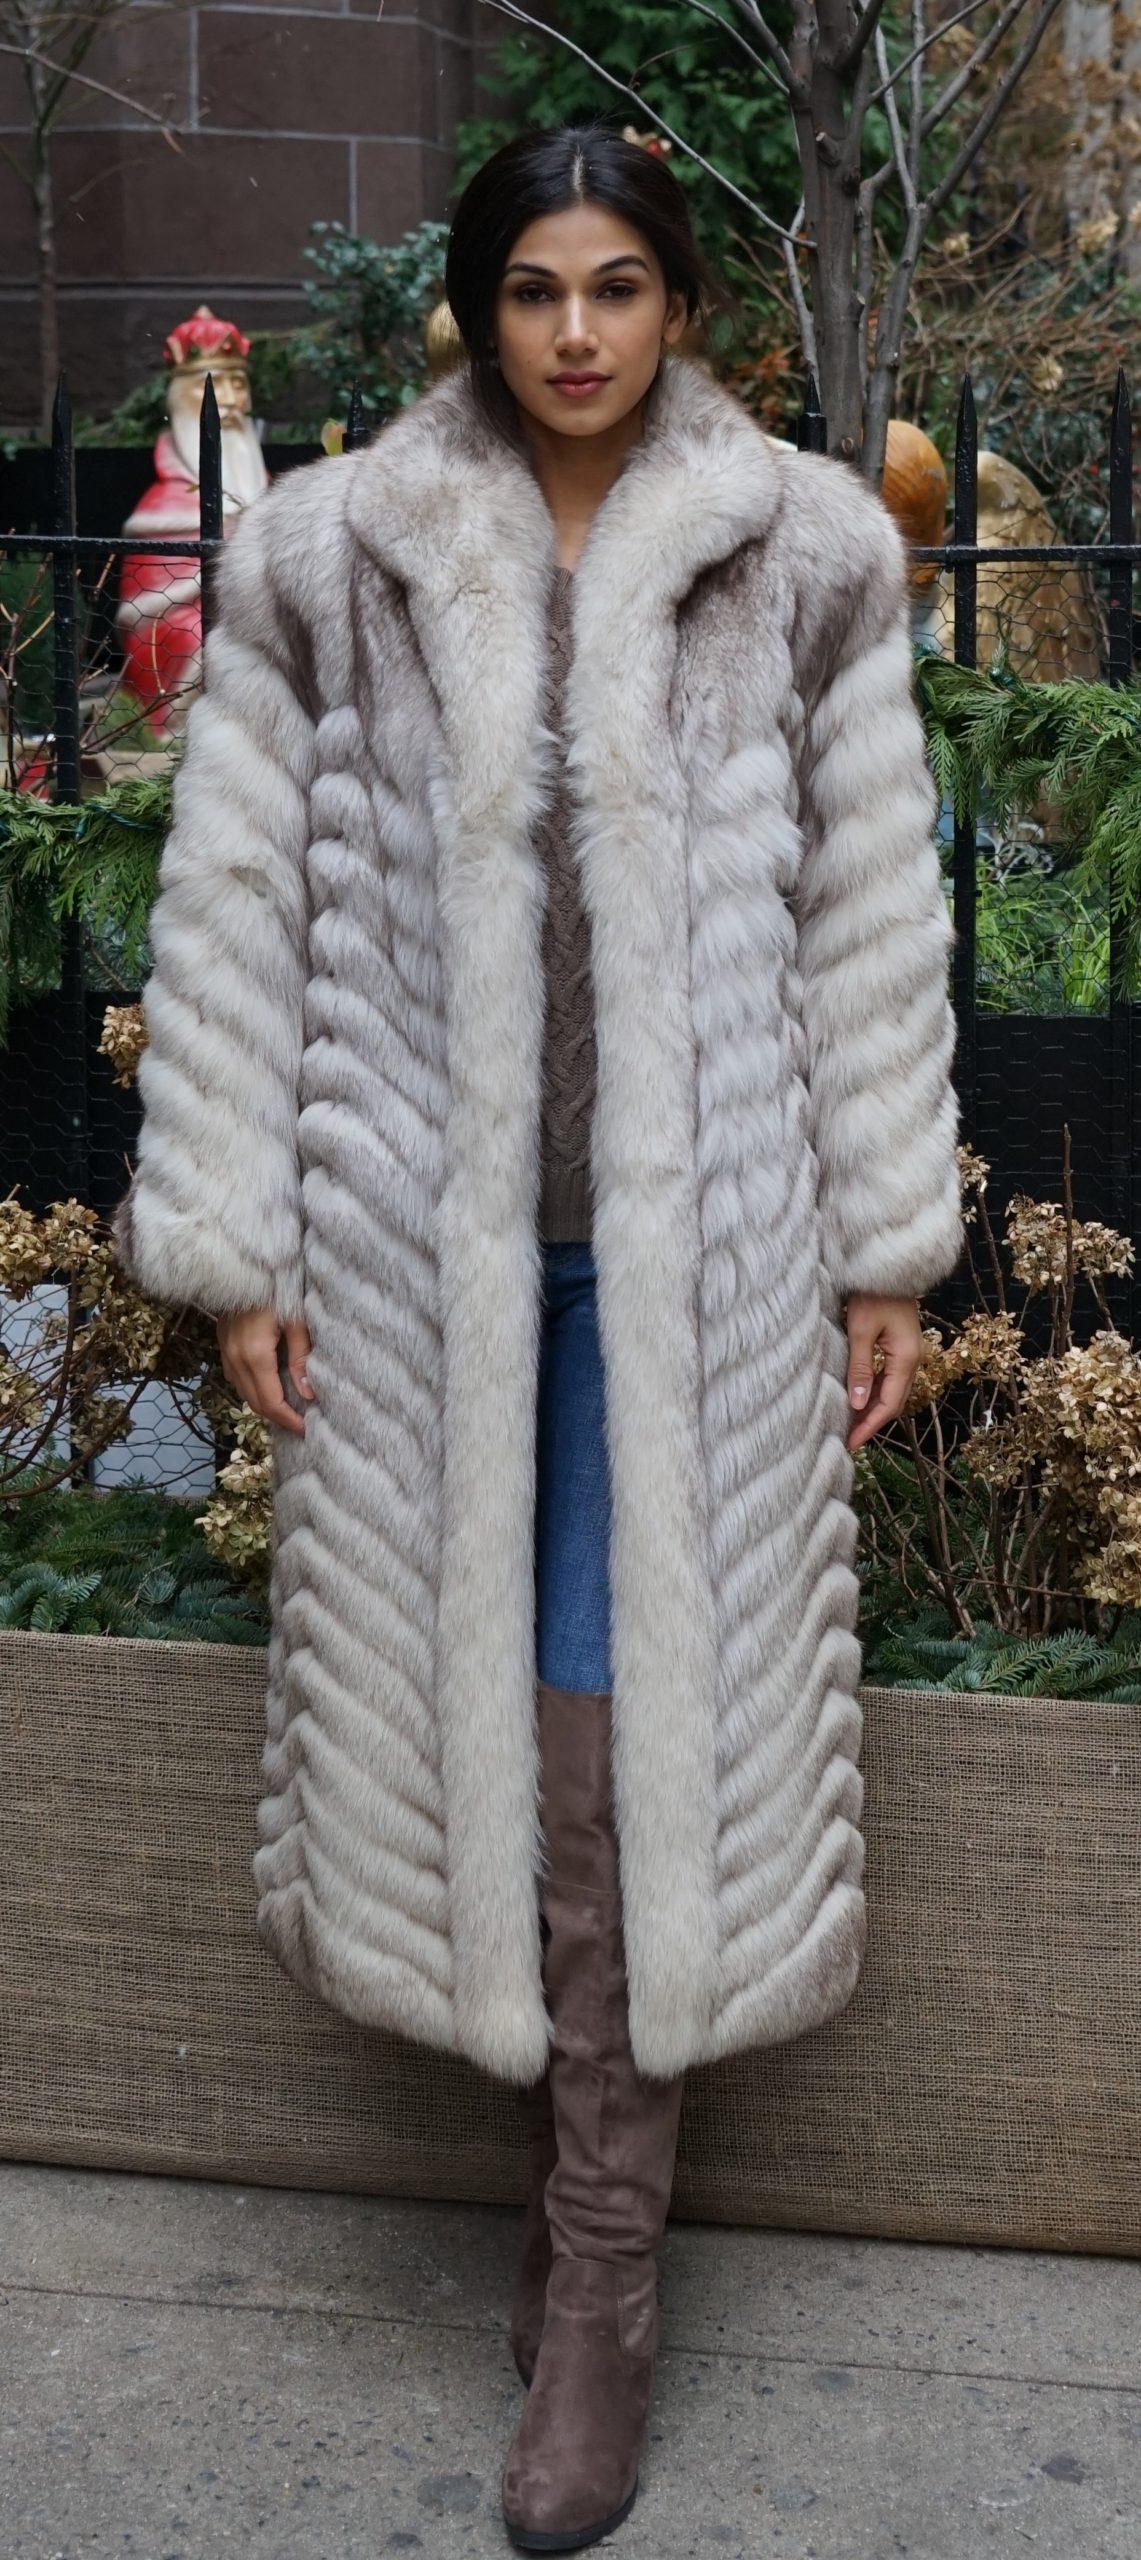 Blue Fox Coat Full length